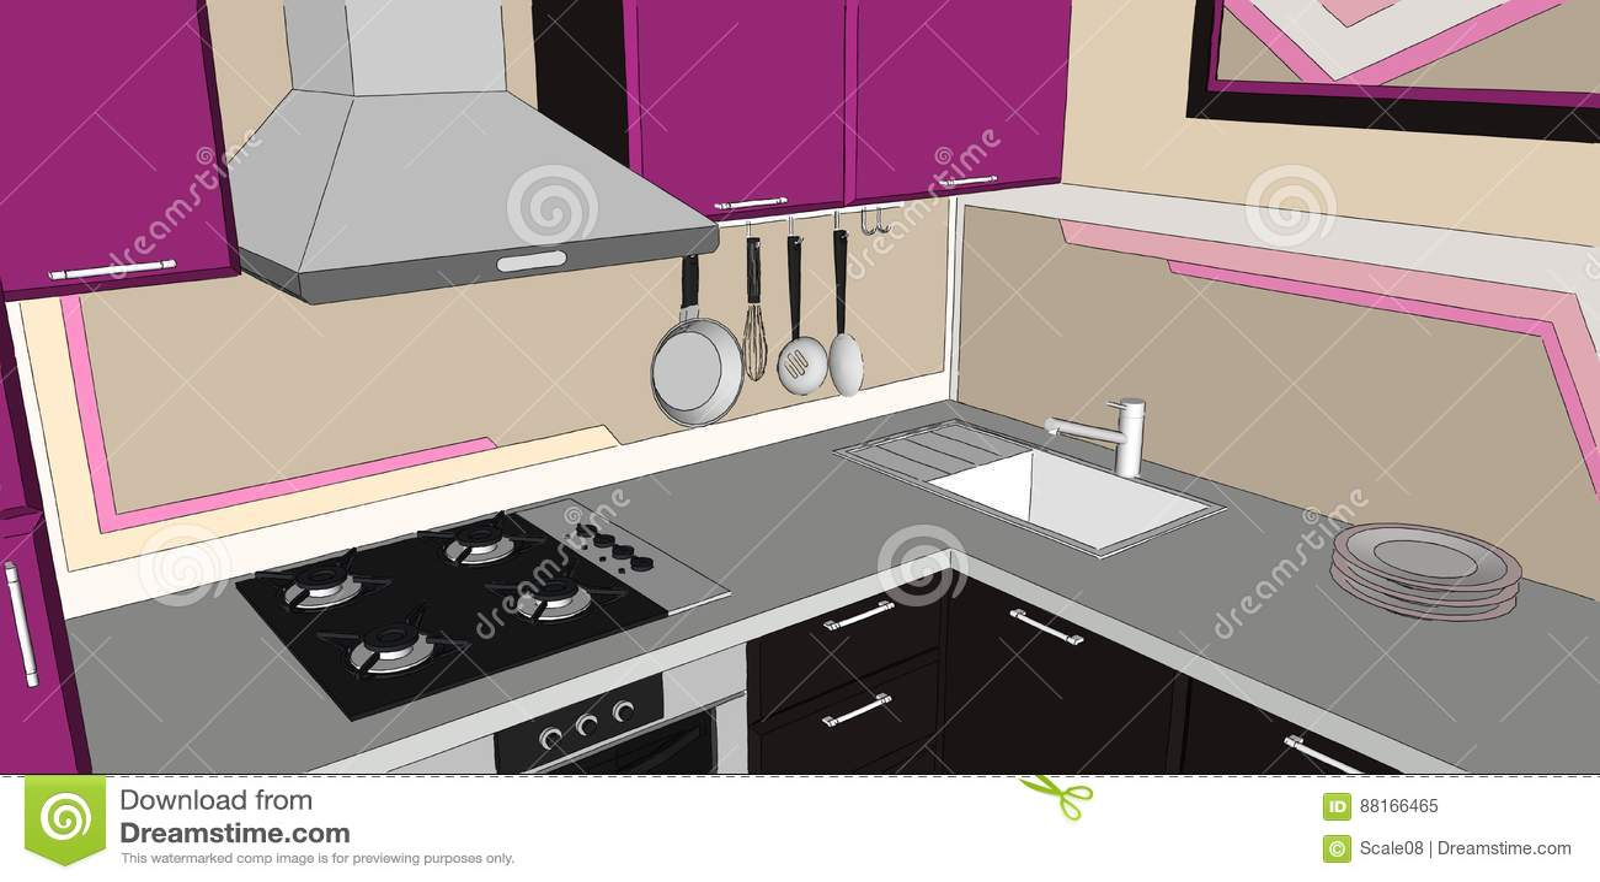 kitchen corner sinks pantry shelves 3d紫色和棕色厨房角落的例证与发烟敞篷 气体滚刀 水槽和墙壁罐的折磨 关闭与发烟敞篷 水槽和墙壁罐机架的现代紫色和棕色厨房角落内部3d例证